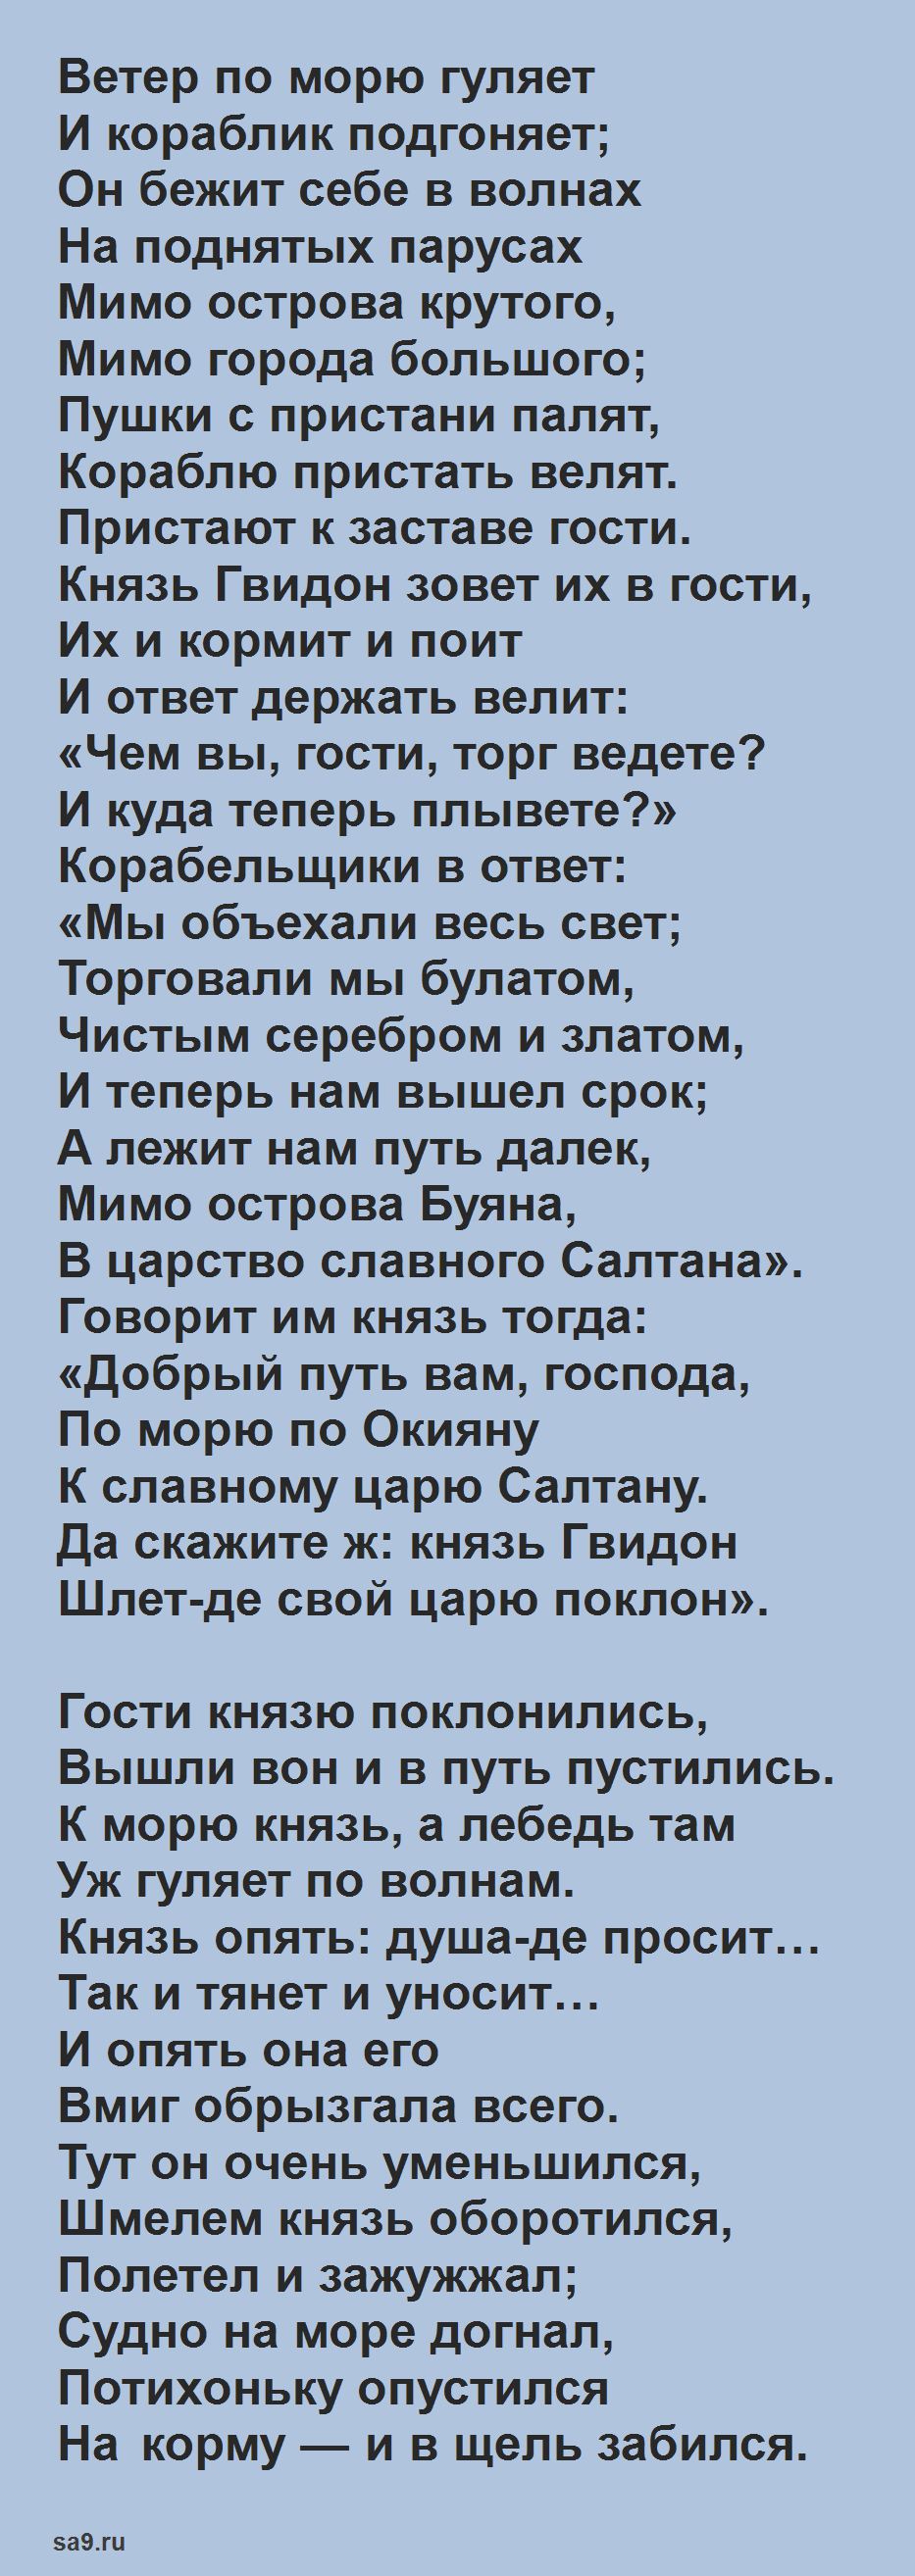 Читать интересную сказку 'О царе Салтане', Александр Сергеевич Пушкин